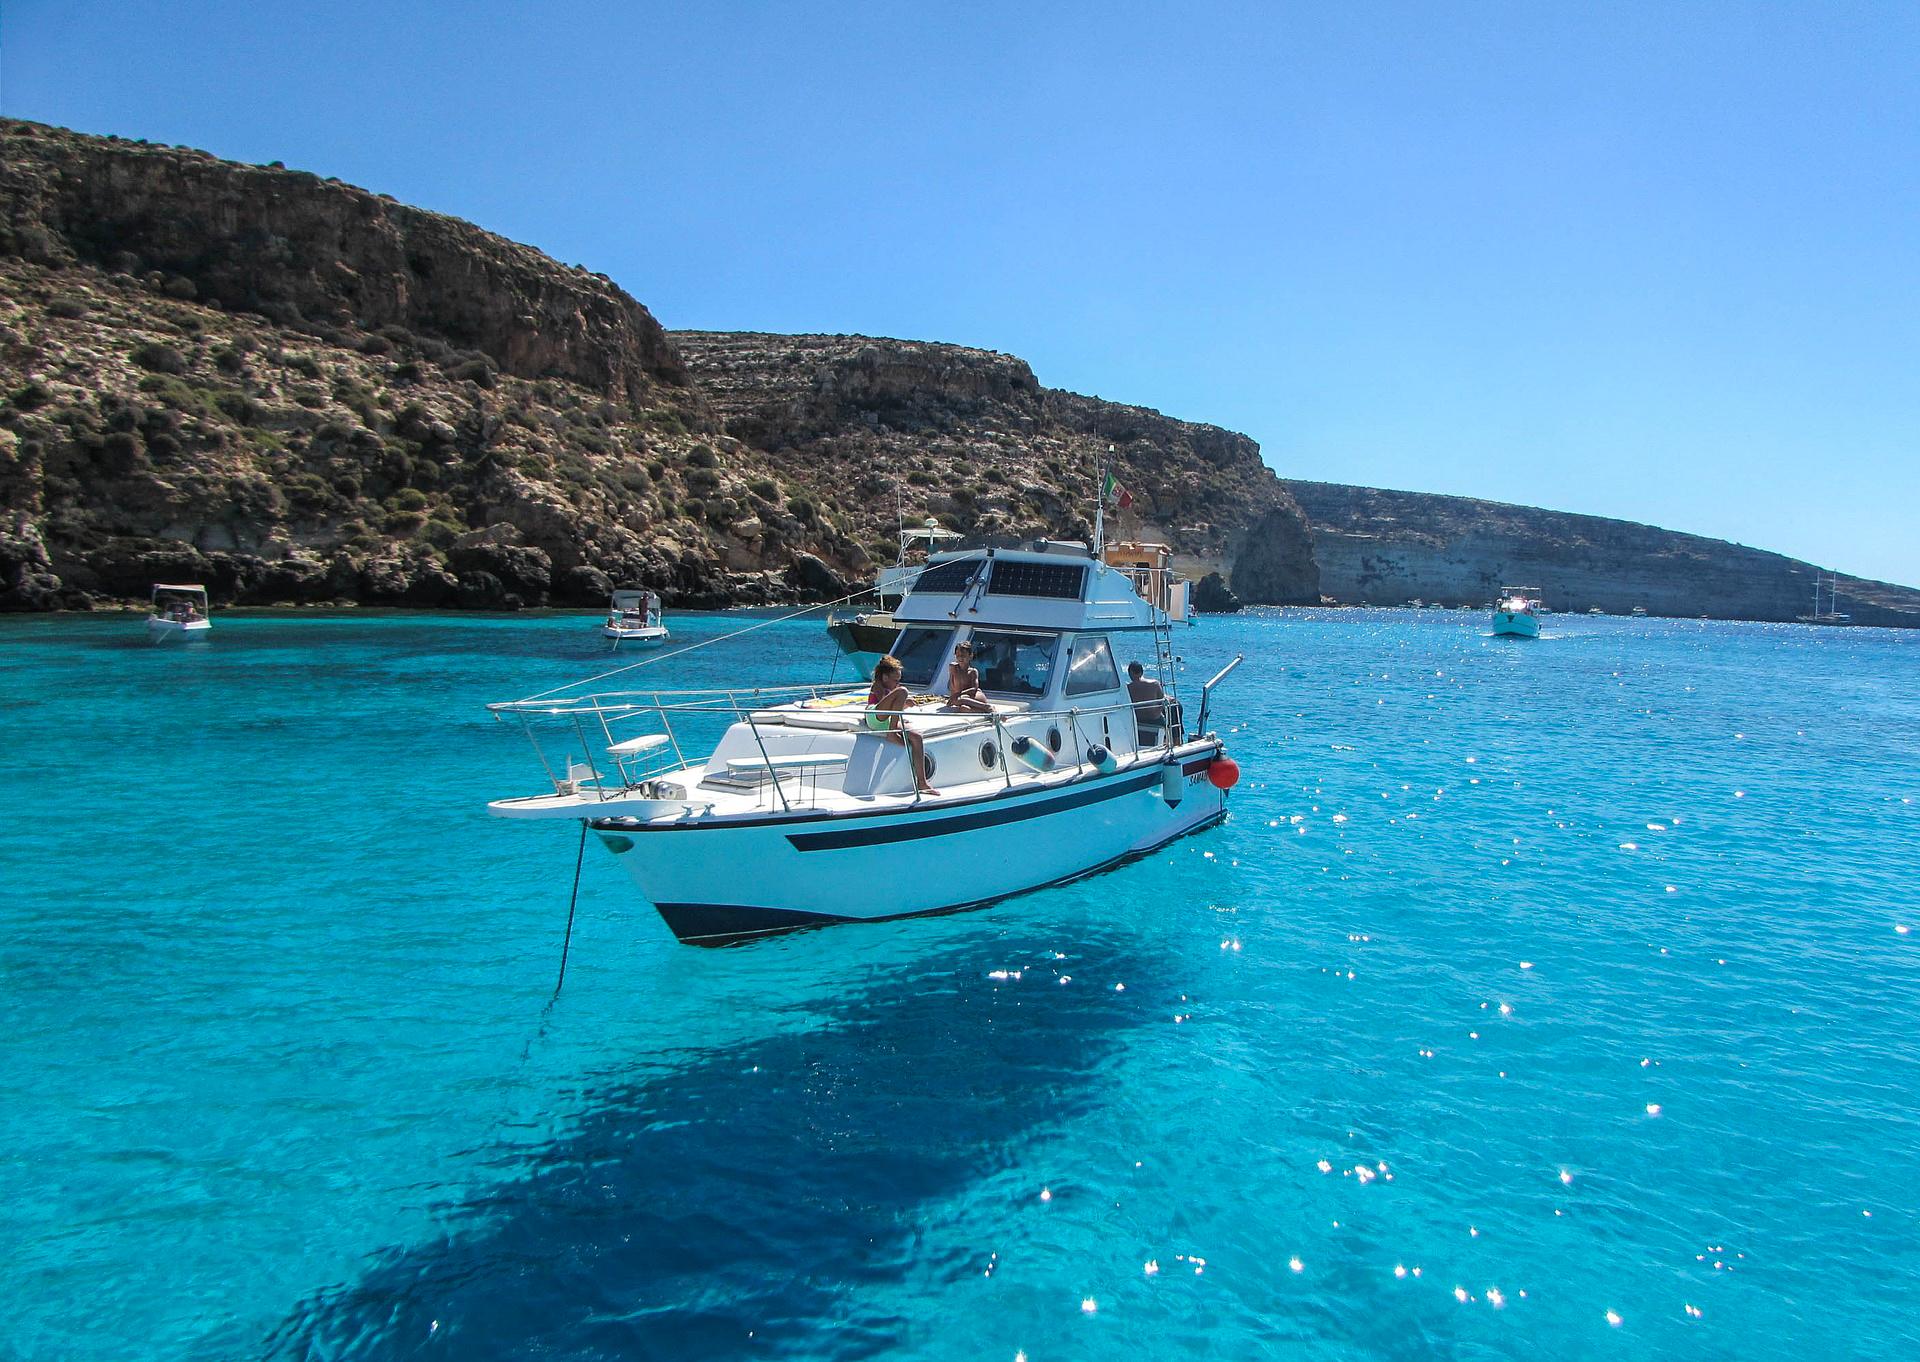 Ein Boot bei Lampedusa in Italien